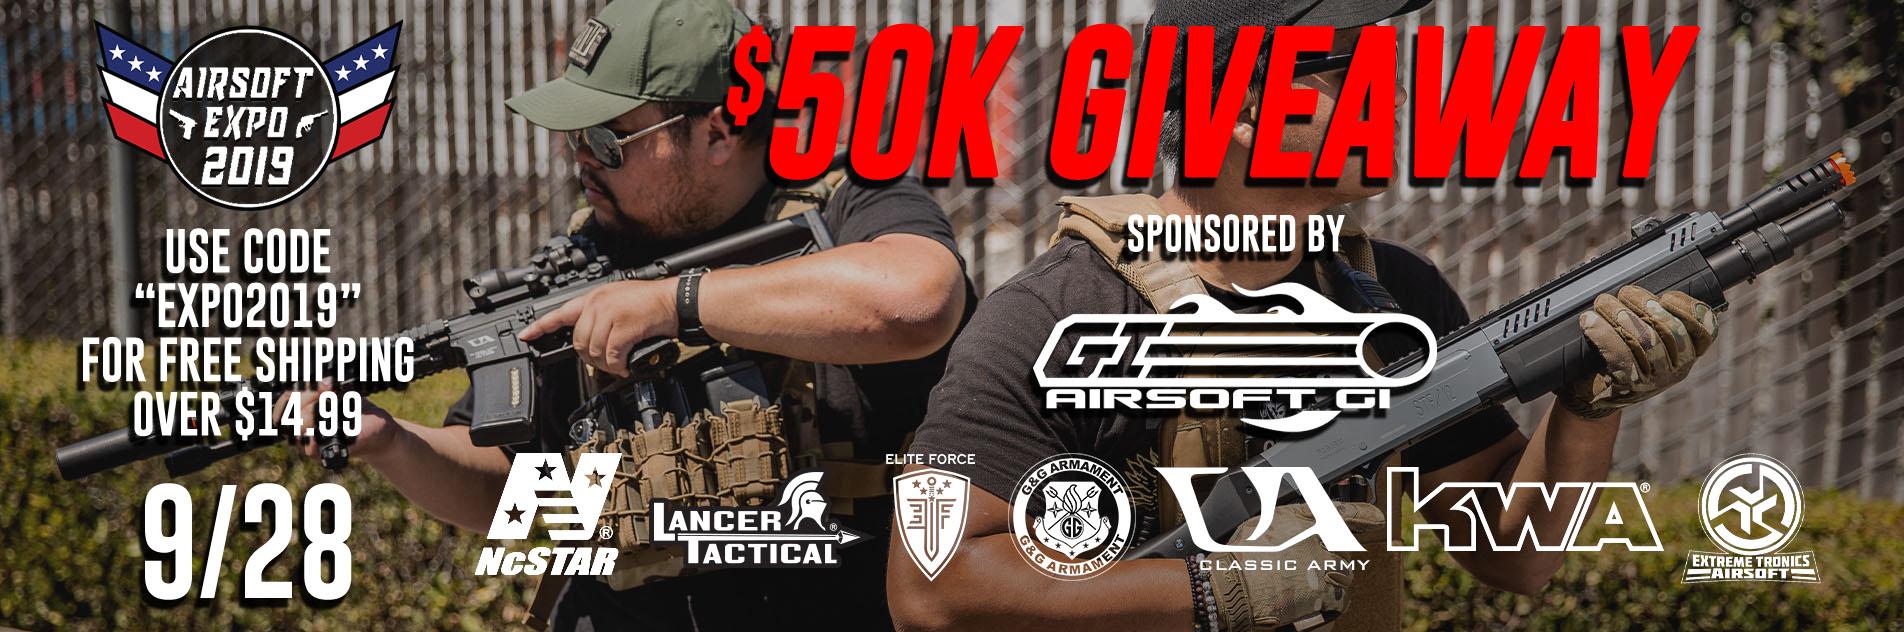 Airsoft GI   Airsoft is a recreational sport for guns